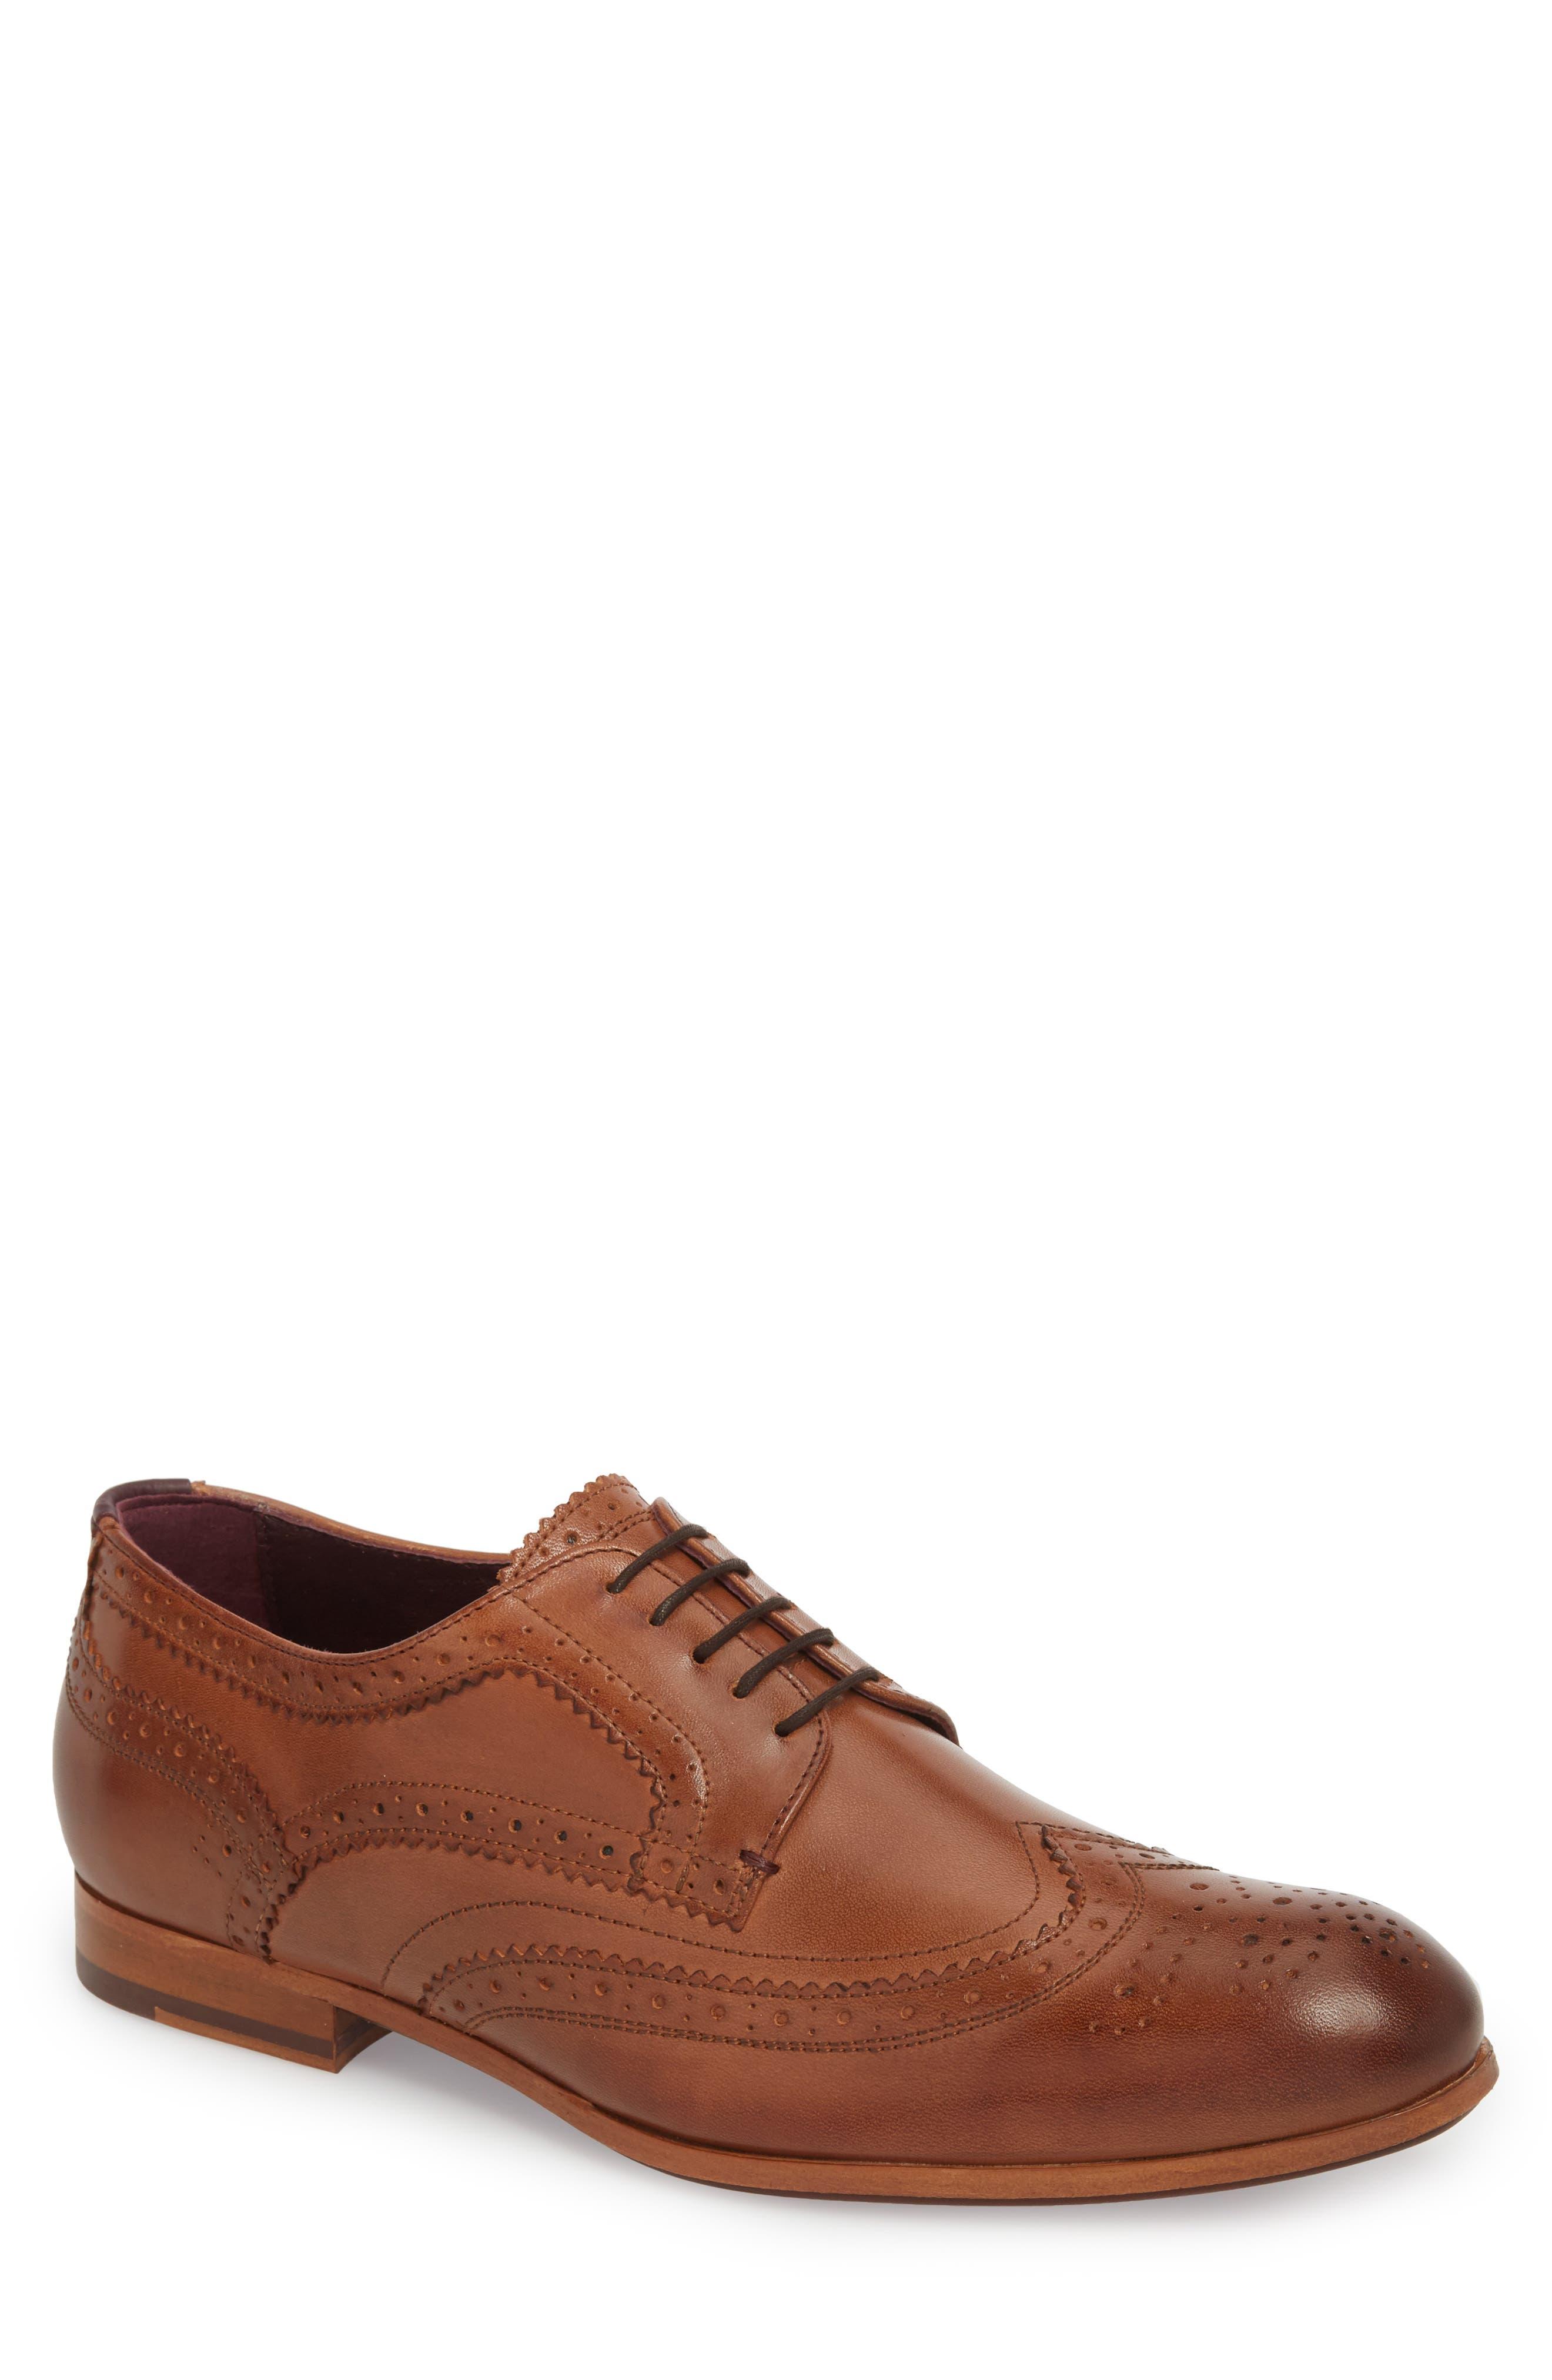 Camyli Wingtip,                             Main thumbnail 1, color,                             Tan Leather